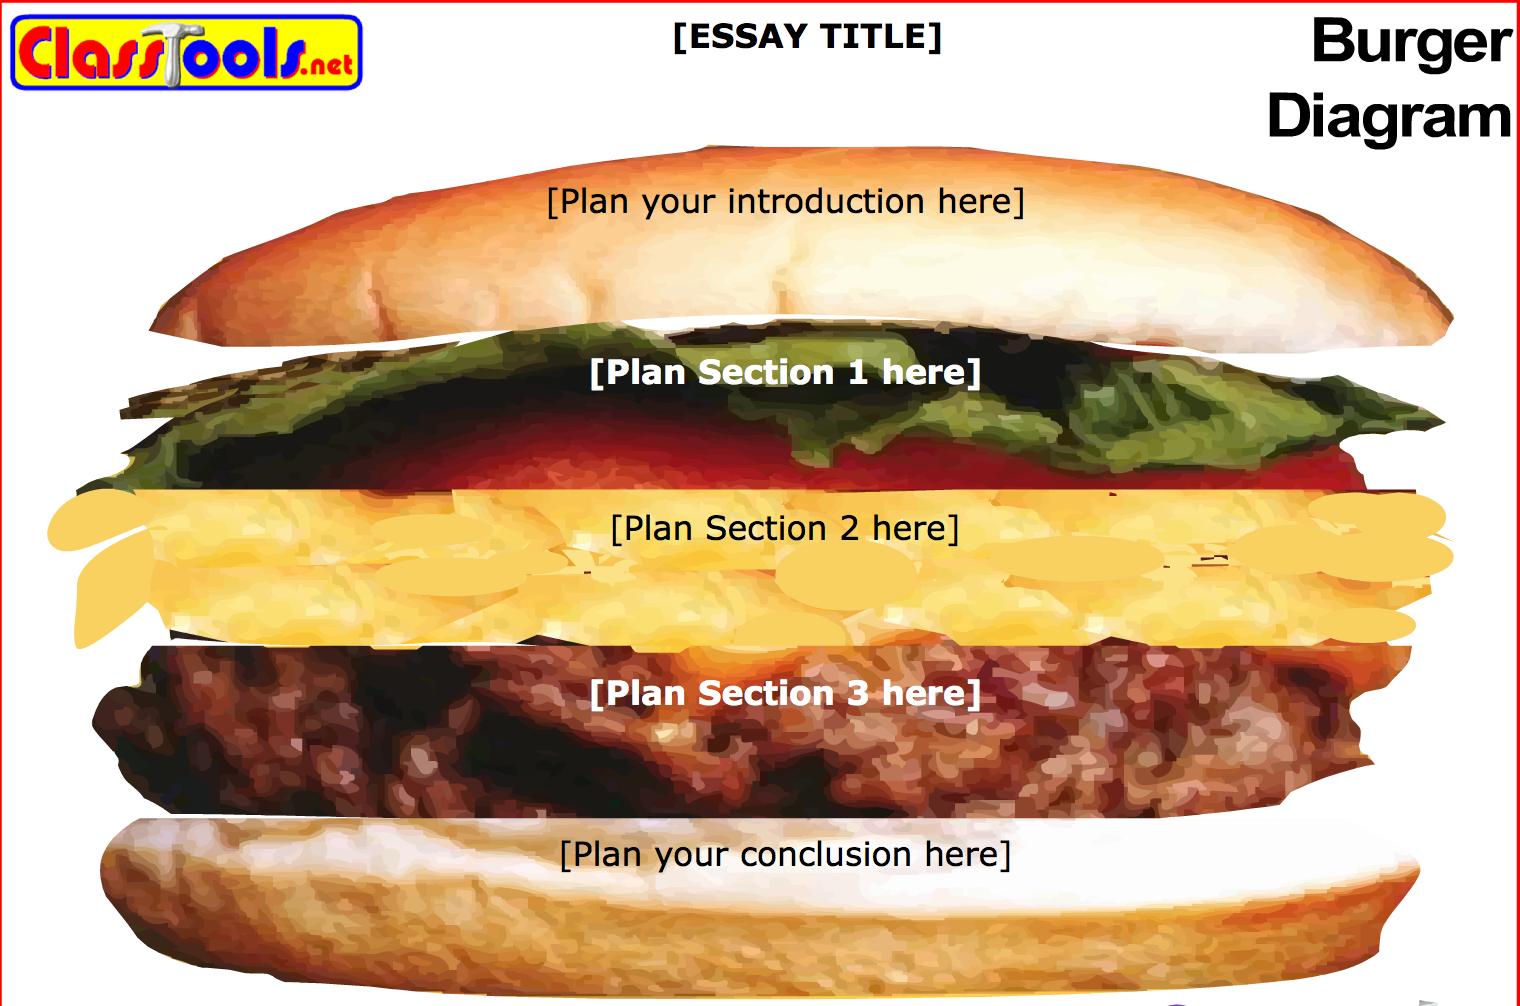 Mental Health Essay Big Tasty Hamburger Essay Argumentative Essay Topics For High School also Essay Paper Writing Service Essay Like Hamburger Health Essay Writing